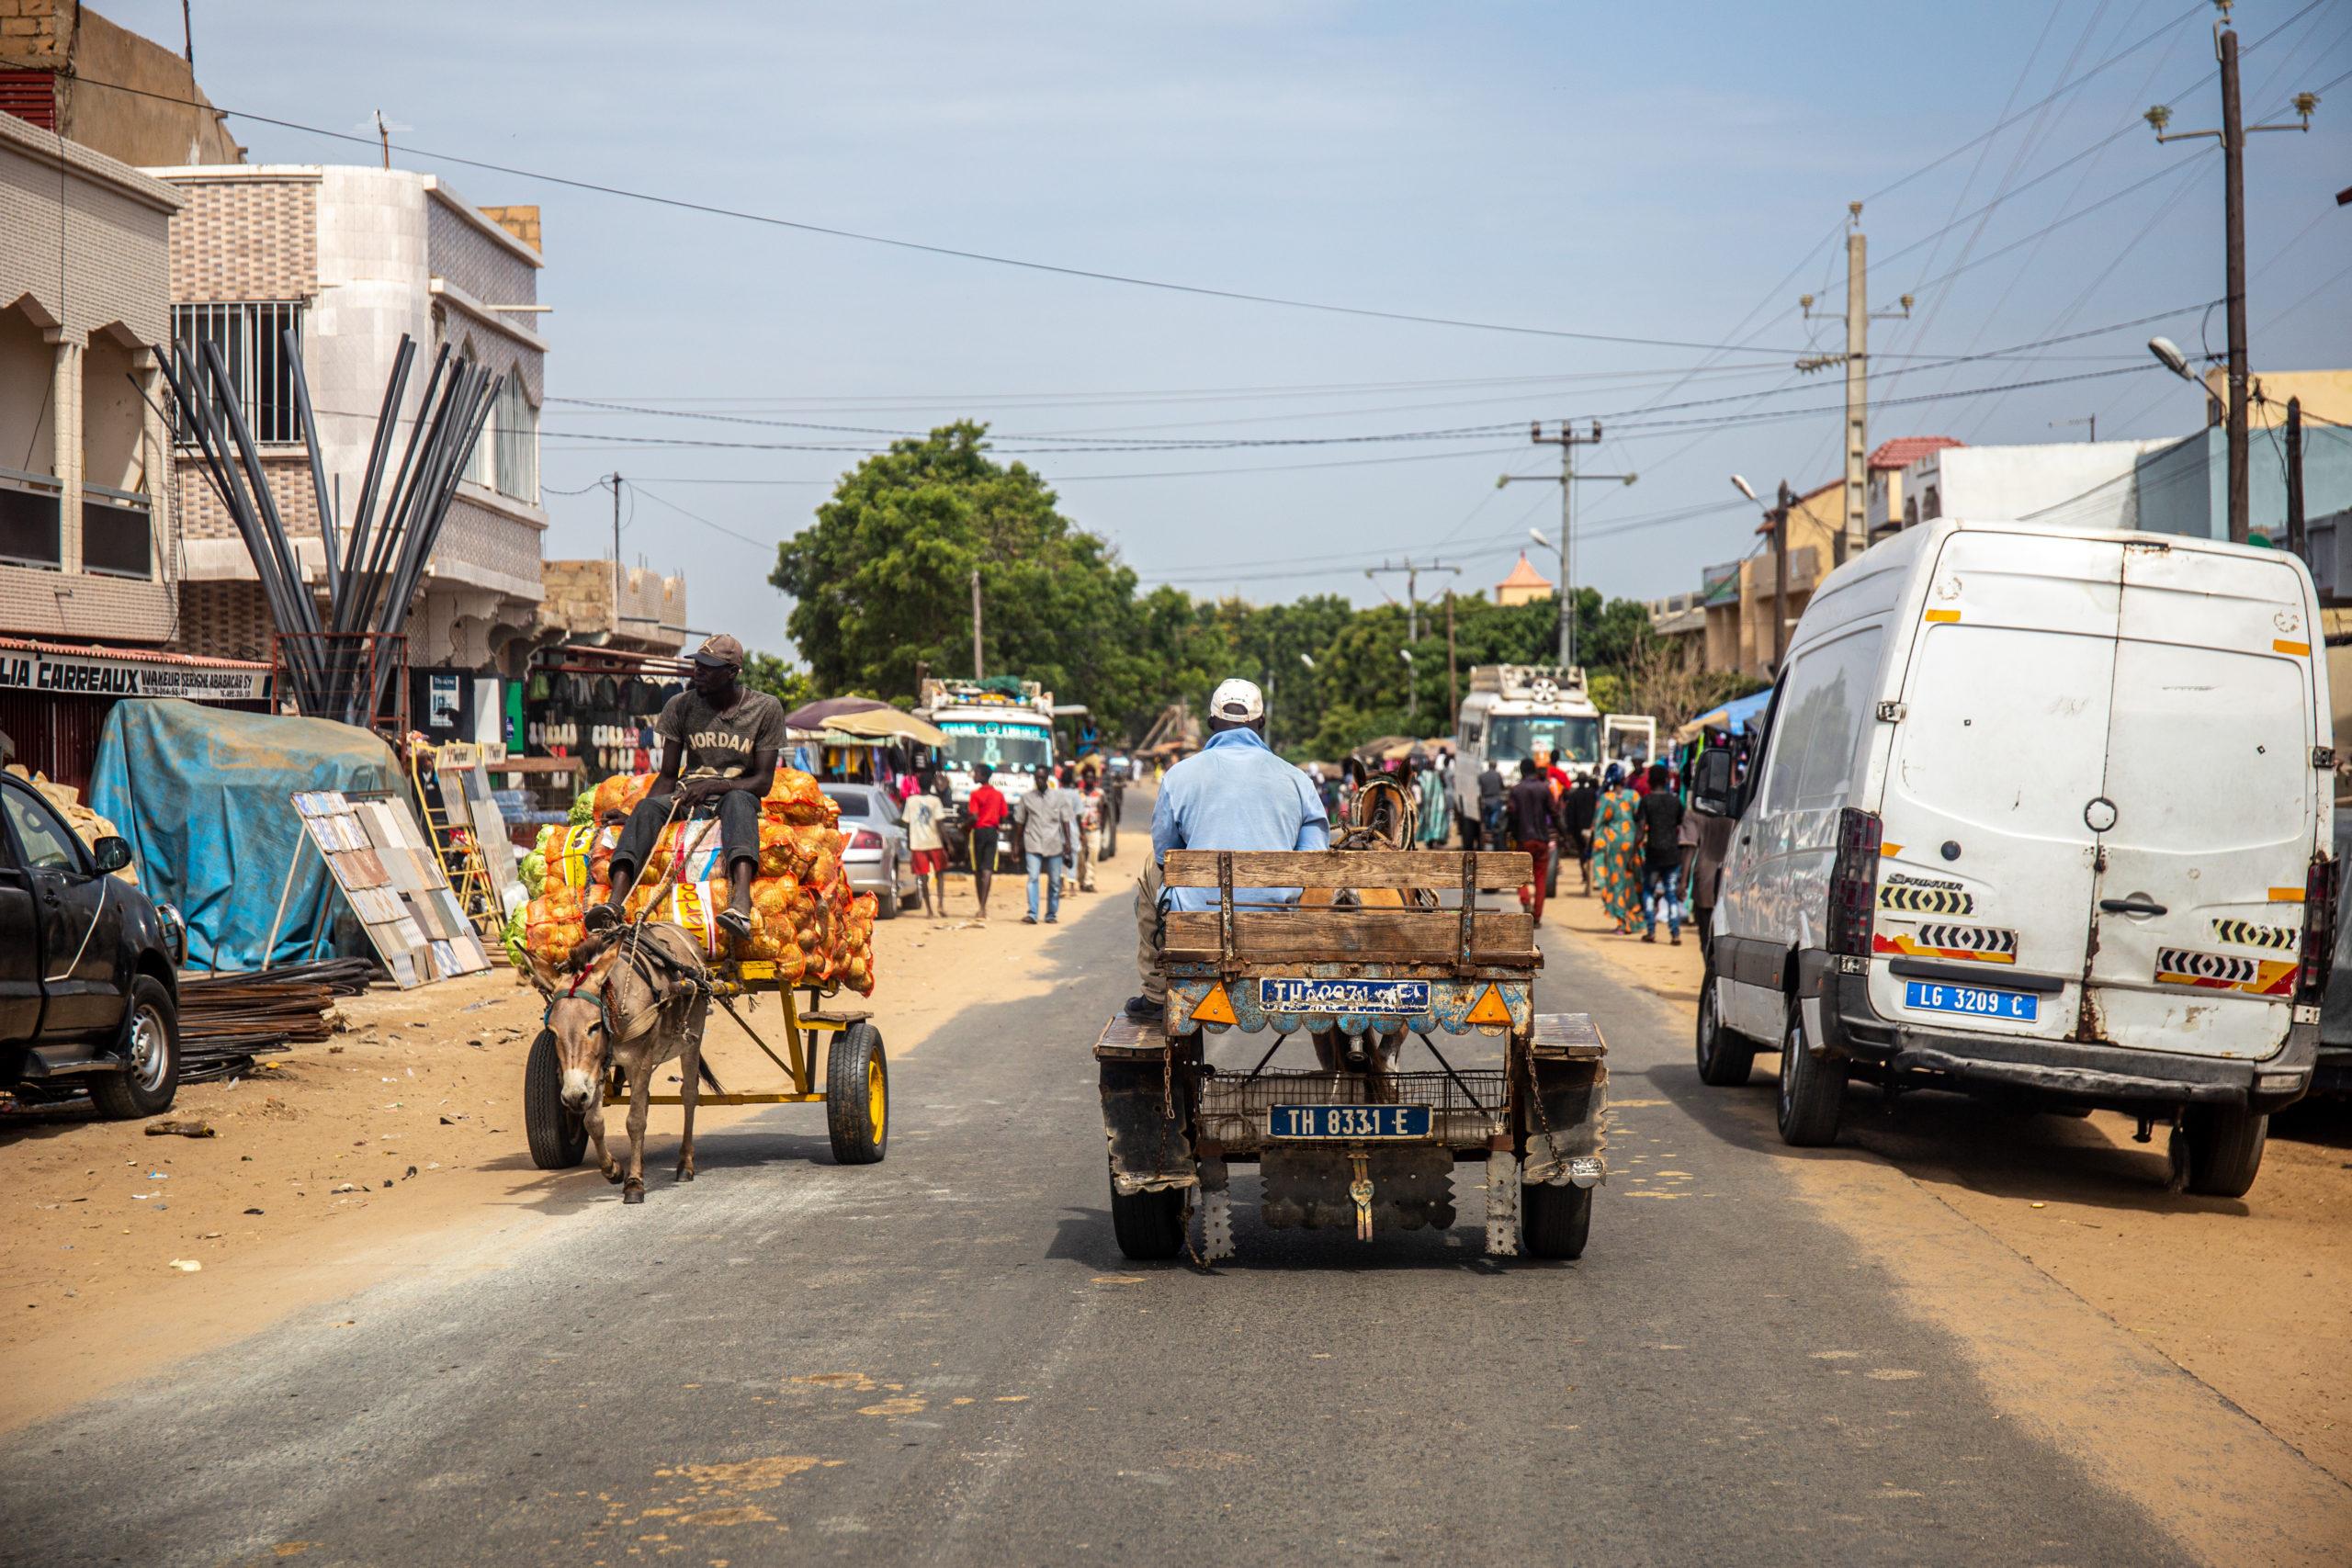 Sénégal - Dakar, Yoff